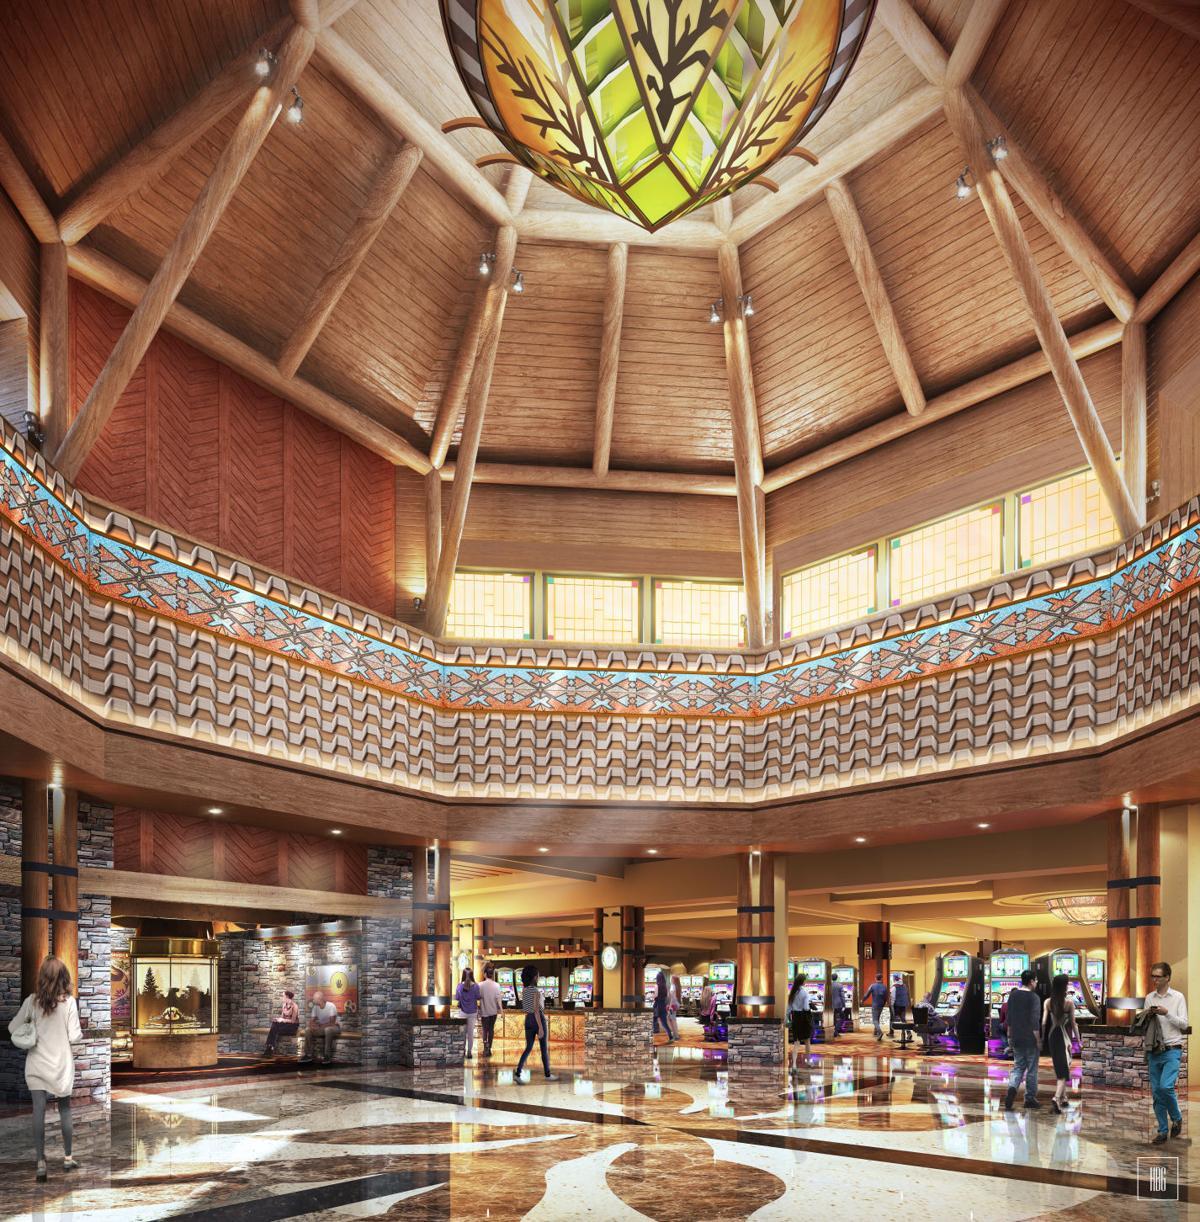 4 winds casino locations